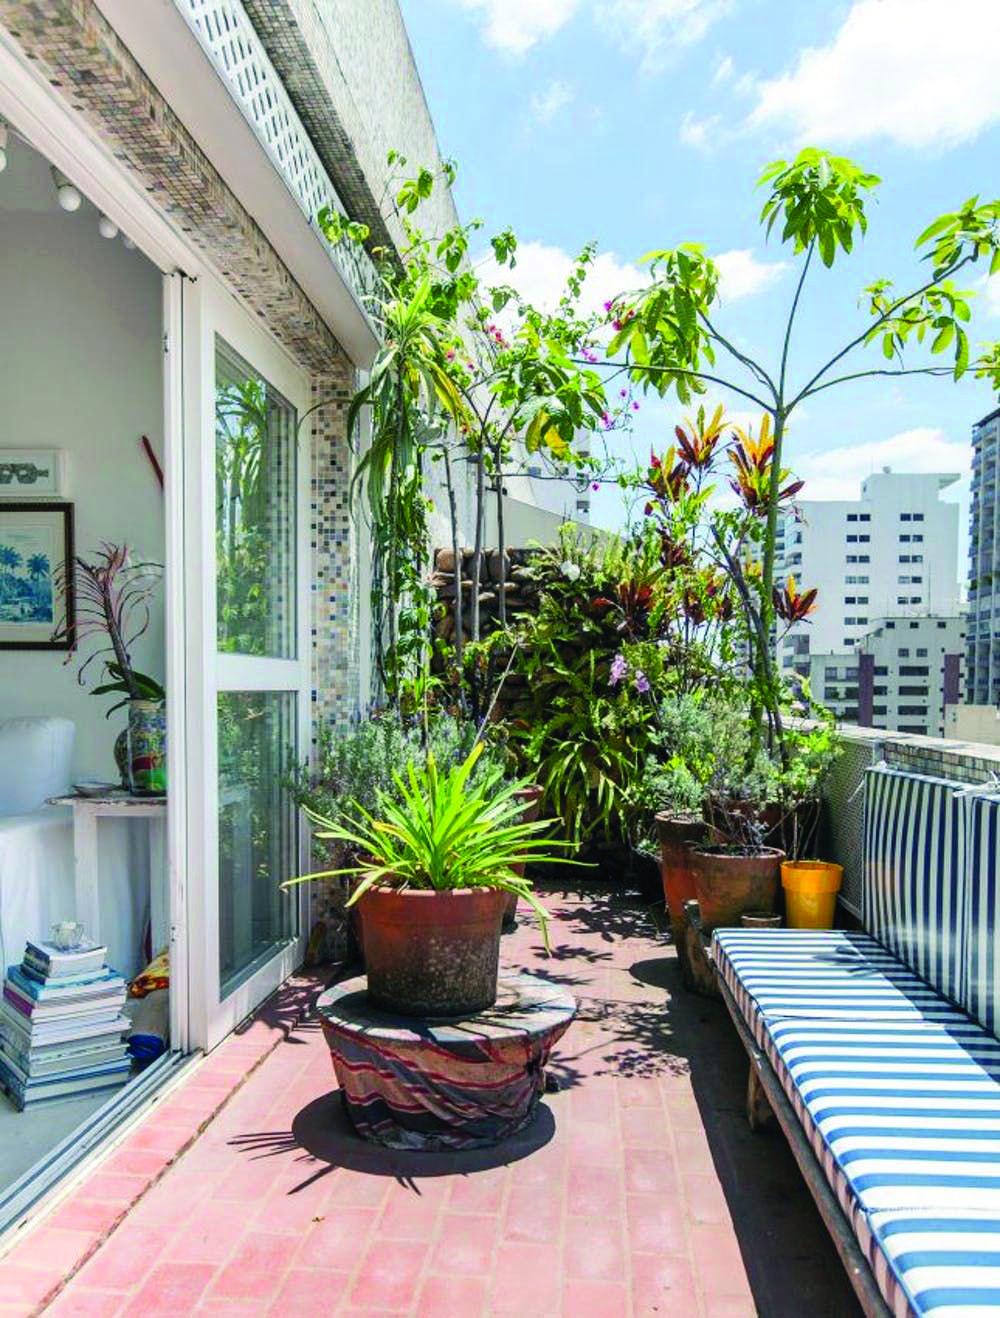 Balcony Garden Small Balcony Balcony Garden Garden Ideas India